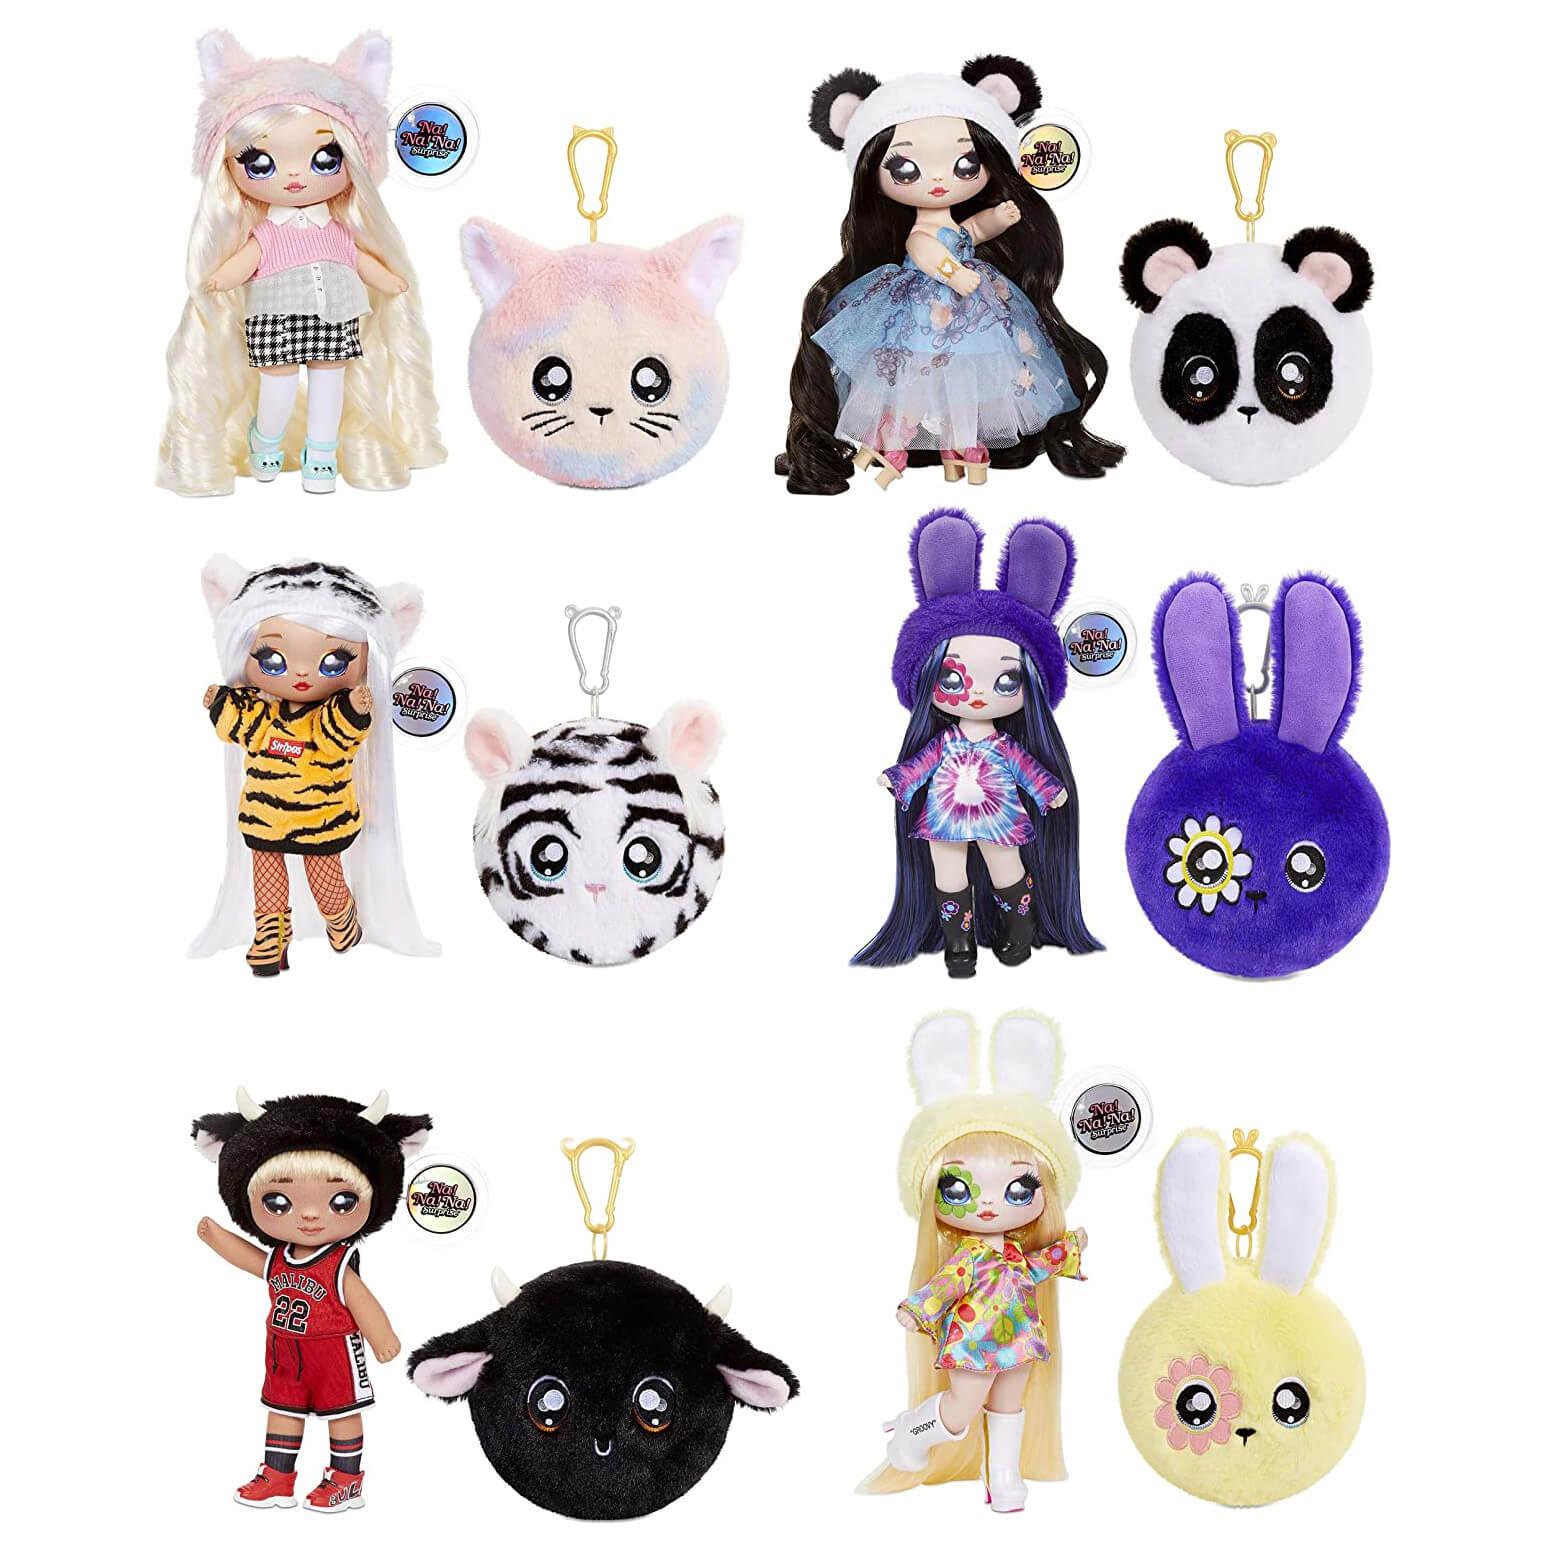 Кукла LOL Surprise Na! Na! Na! Surprise PLUSH COLLECTIBLE 4 Серия с мягкими куклами внутри - 2